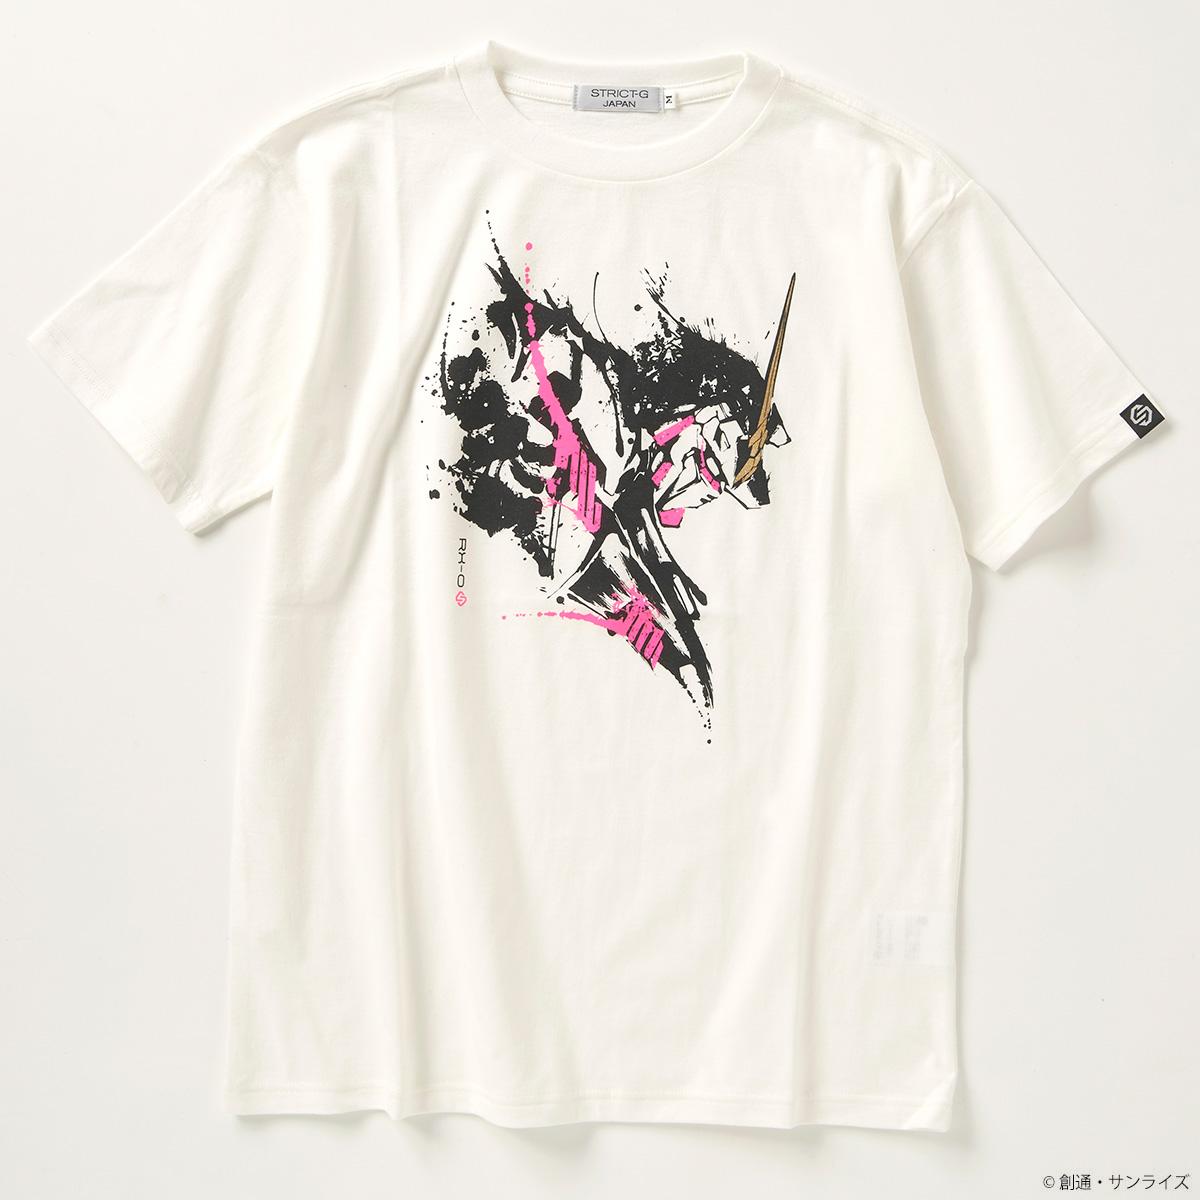 STRICT-G JAPAN アーカイブより、 筆絵Tシャツシリーズ、オンラインショップにて販売開始!